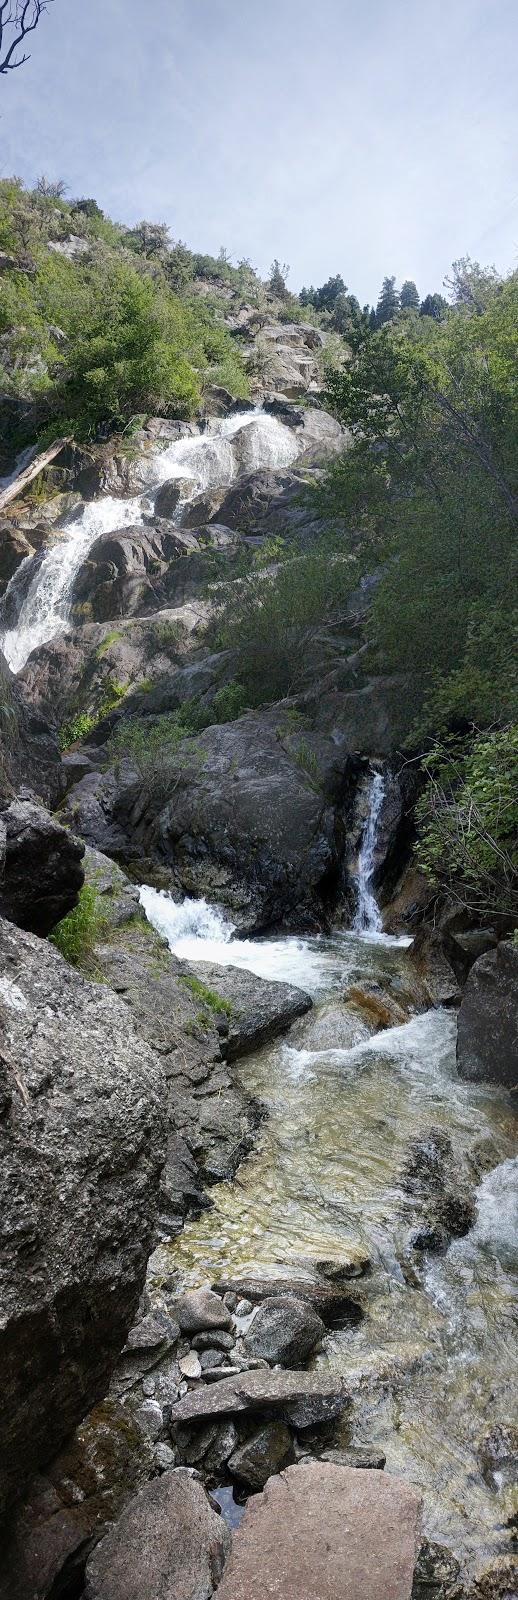 Lower Section of Horsetail Falls Alpine, Utah Lone Peak Wilderness Area